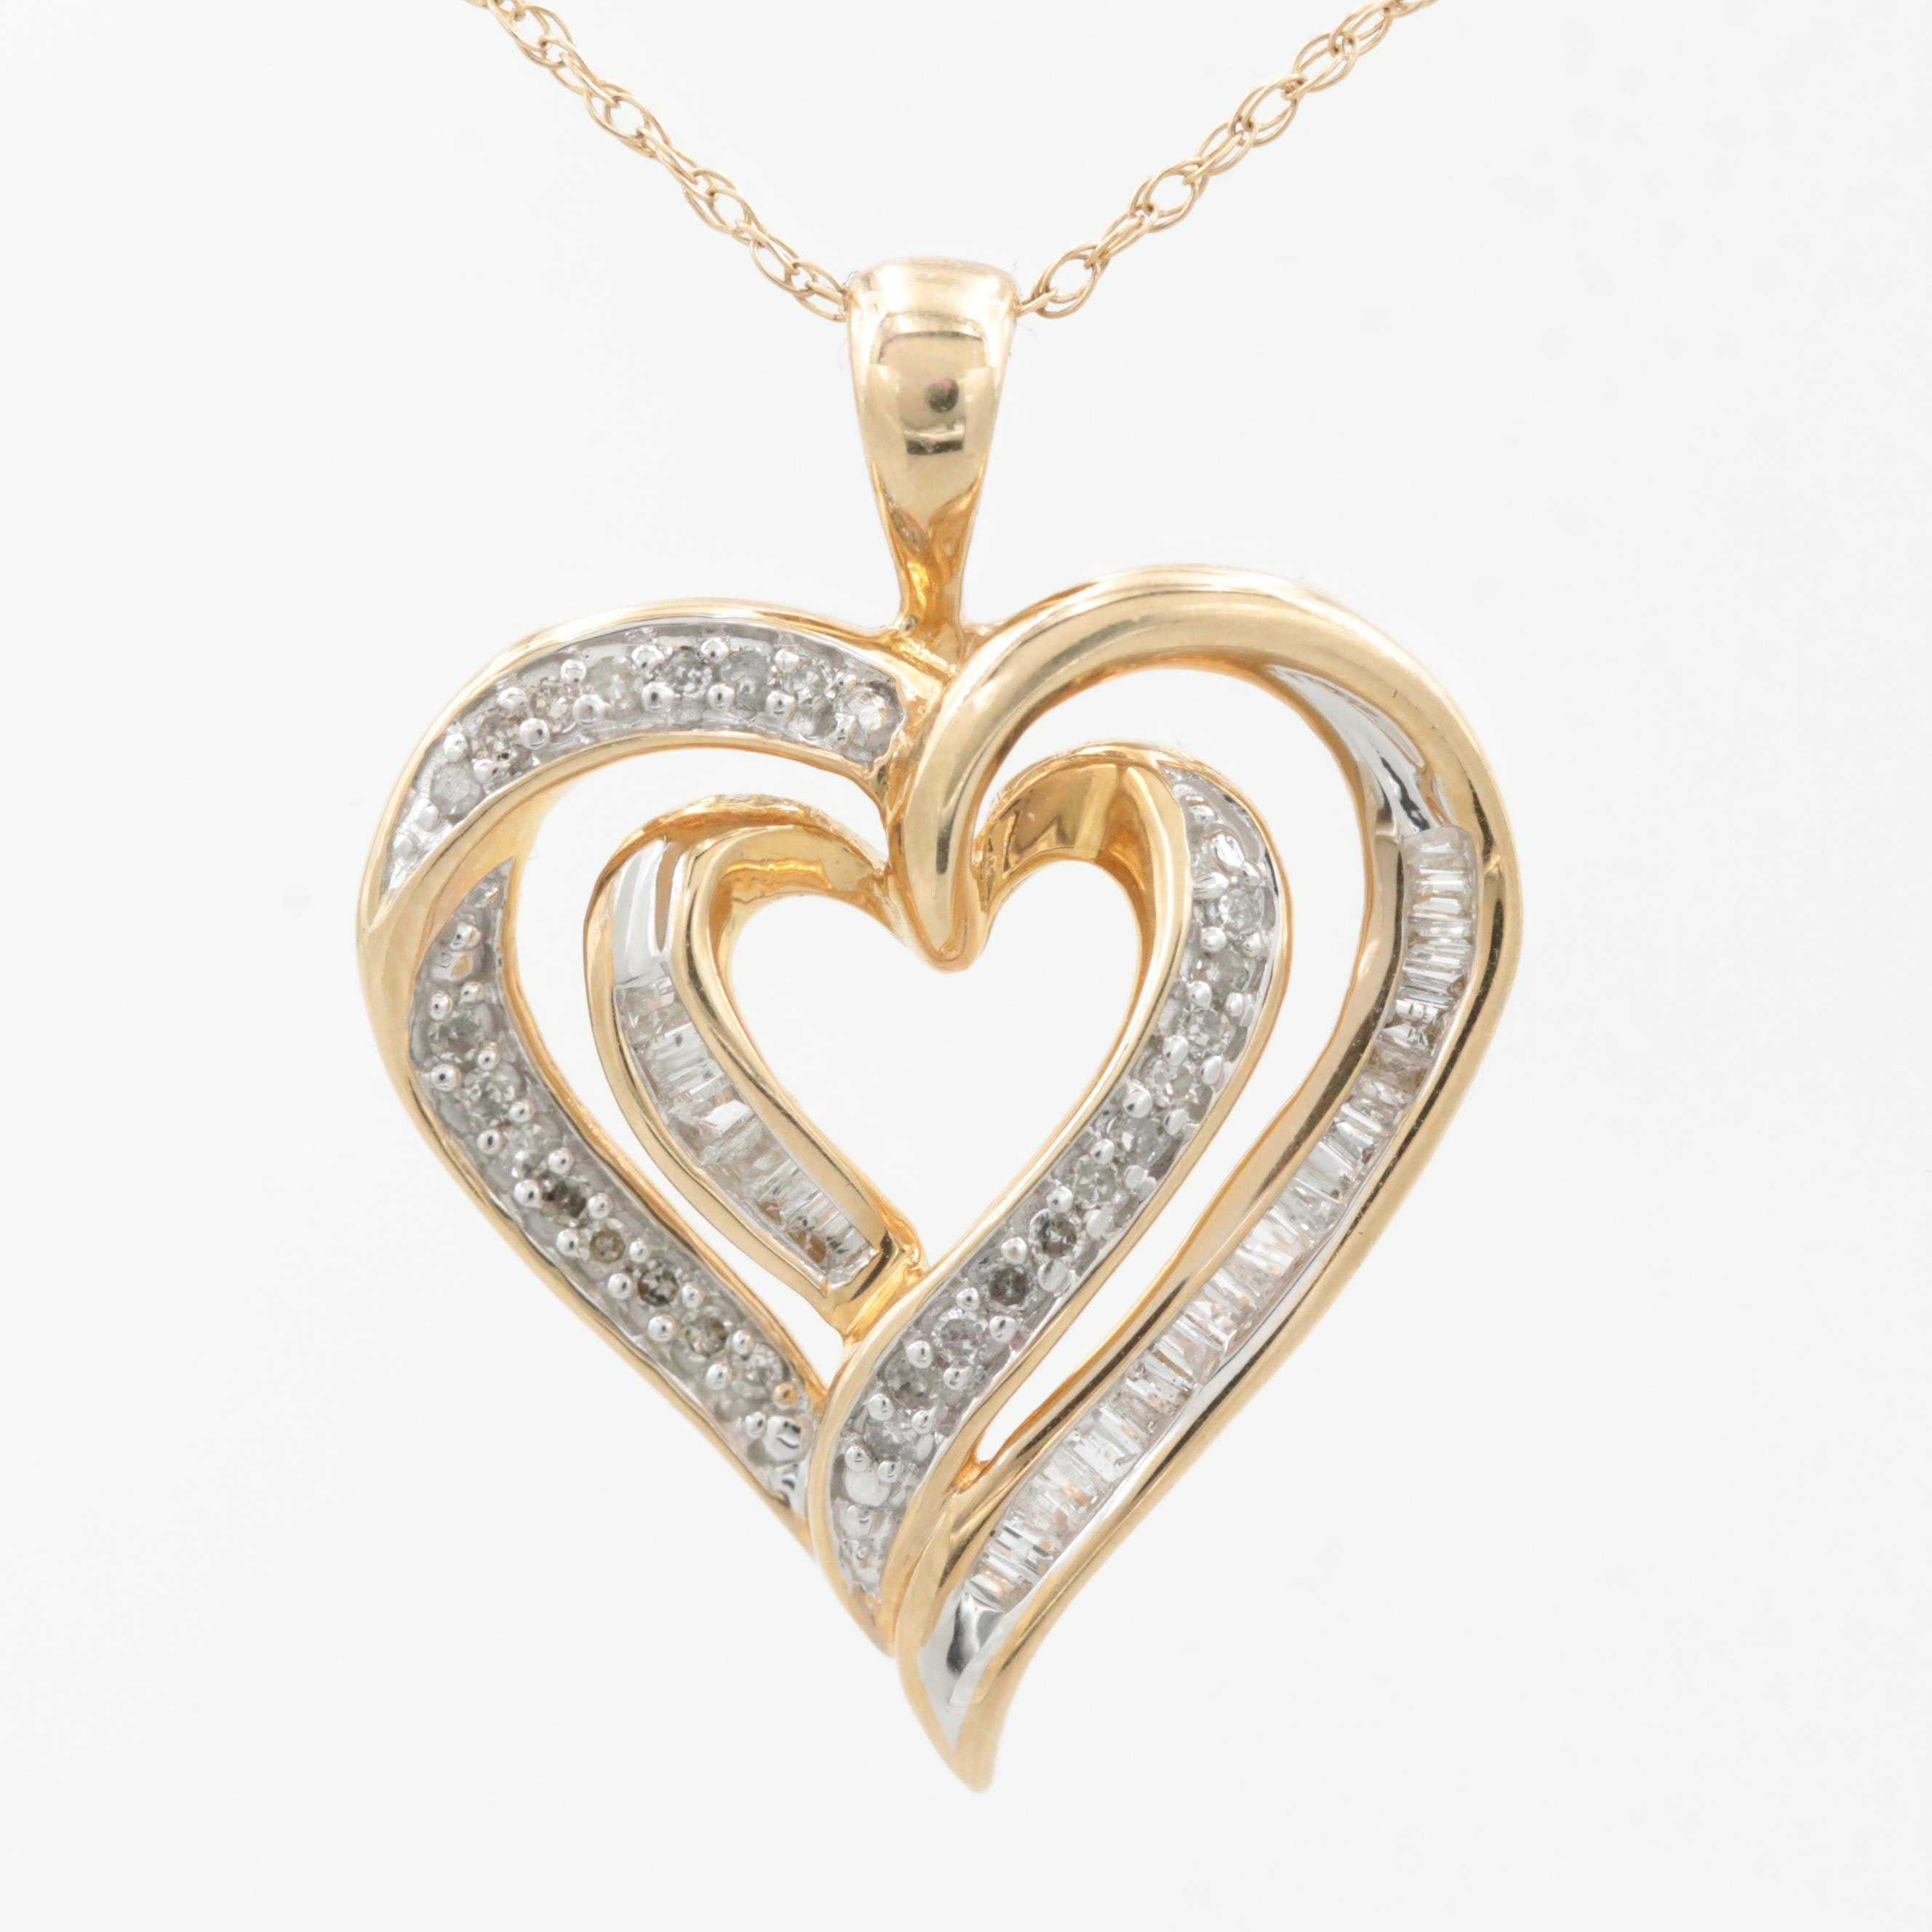 10K Yellow Gold Diamond Heart Necklace